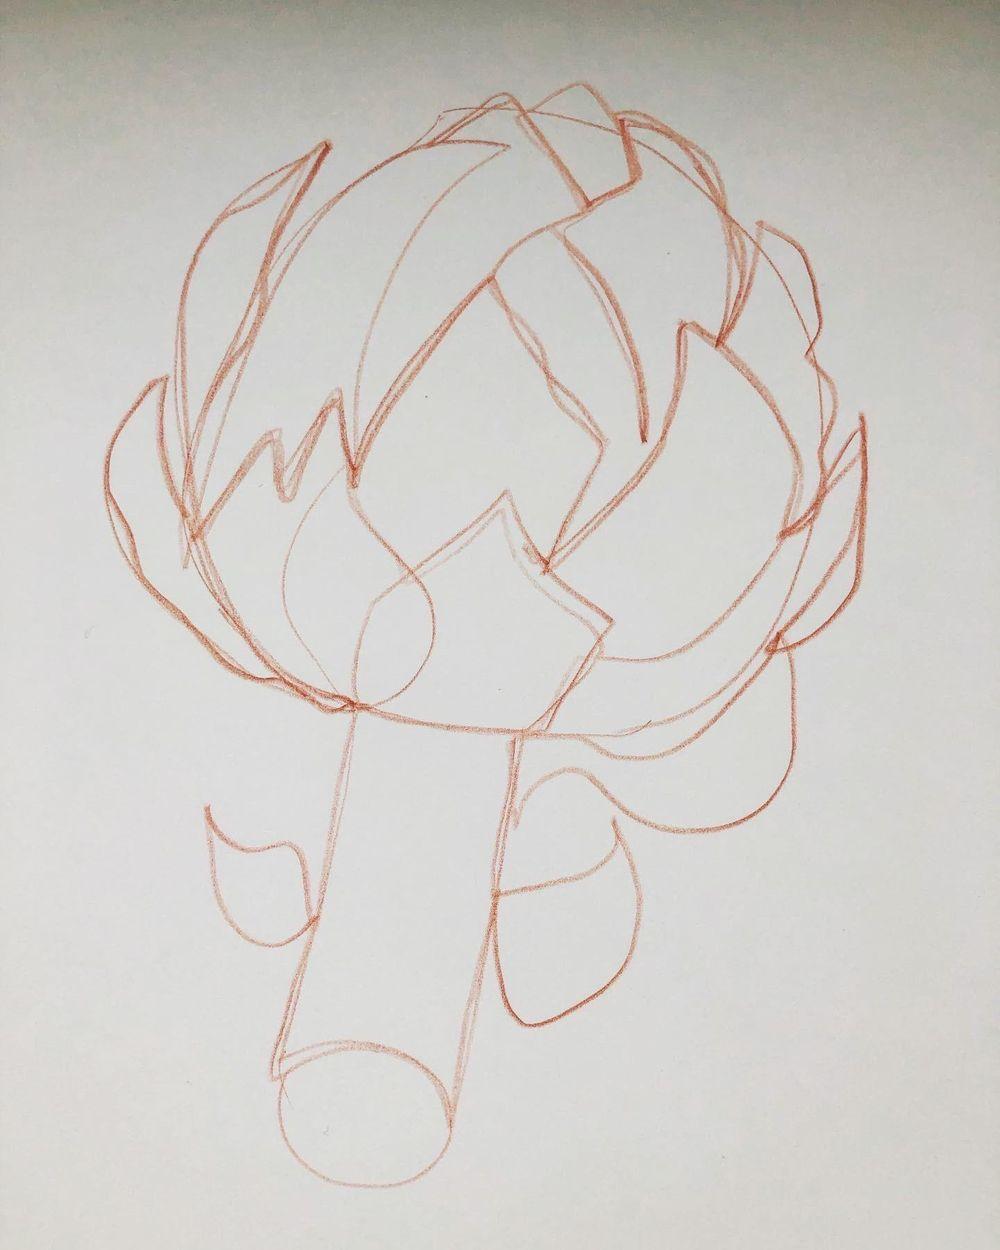 Exploration - artichoke drawings - image 4 - student project